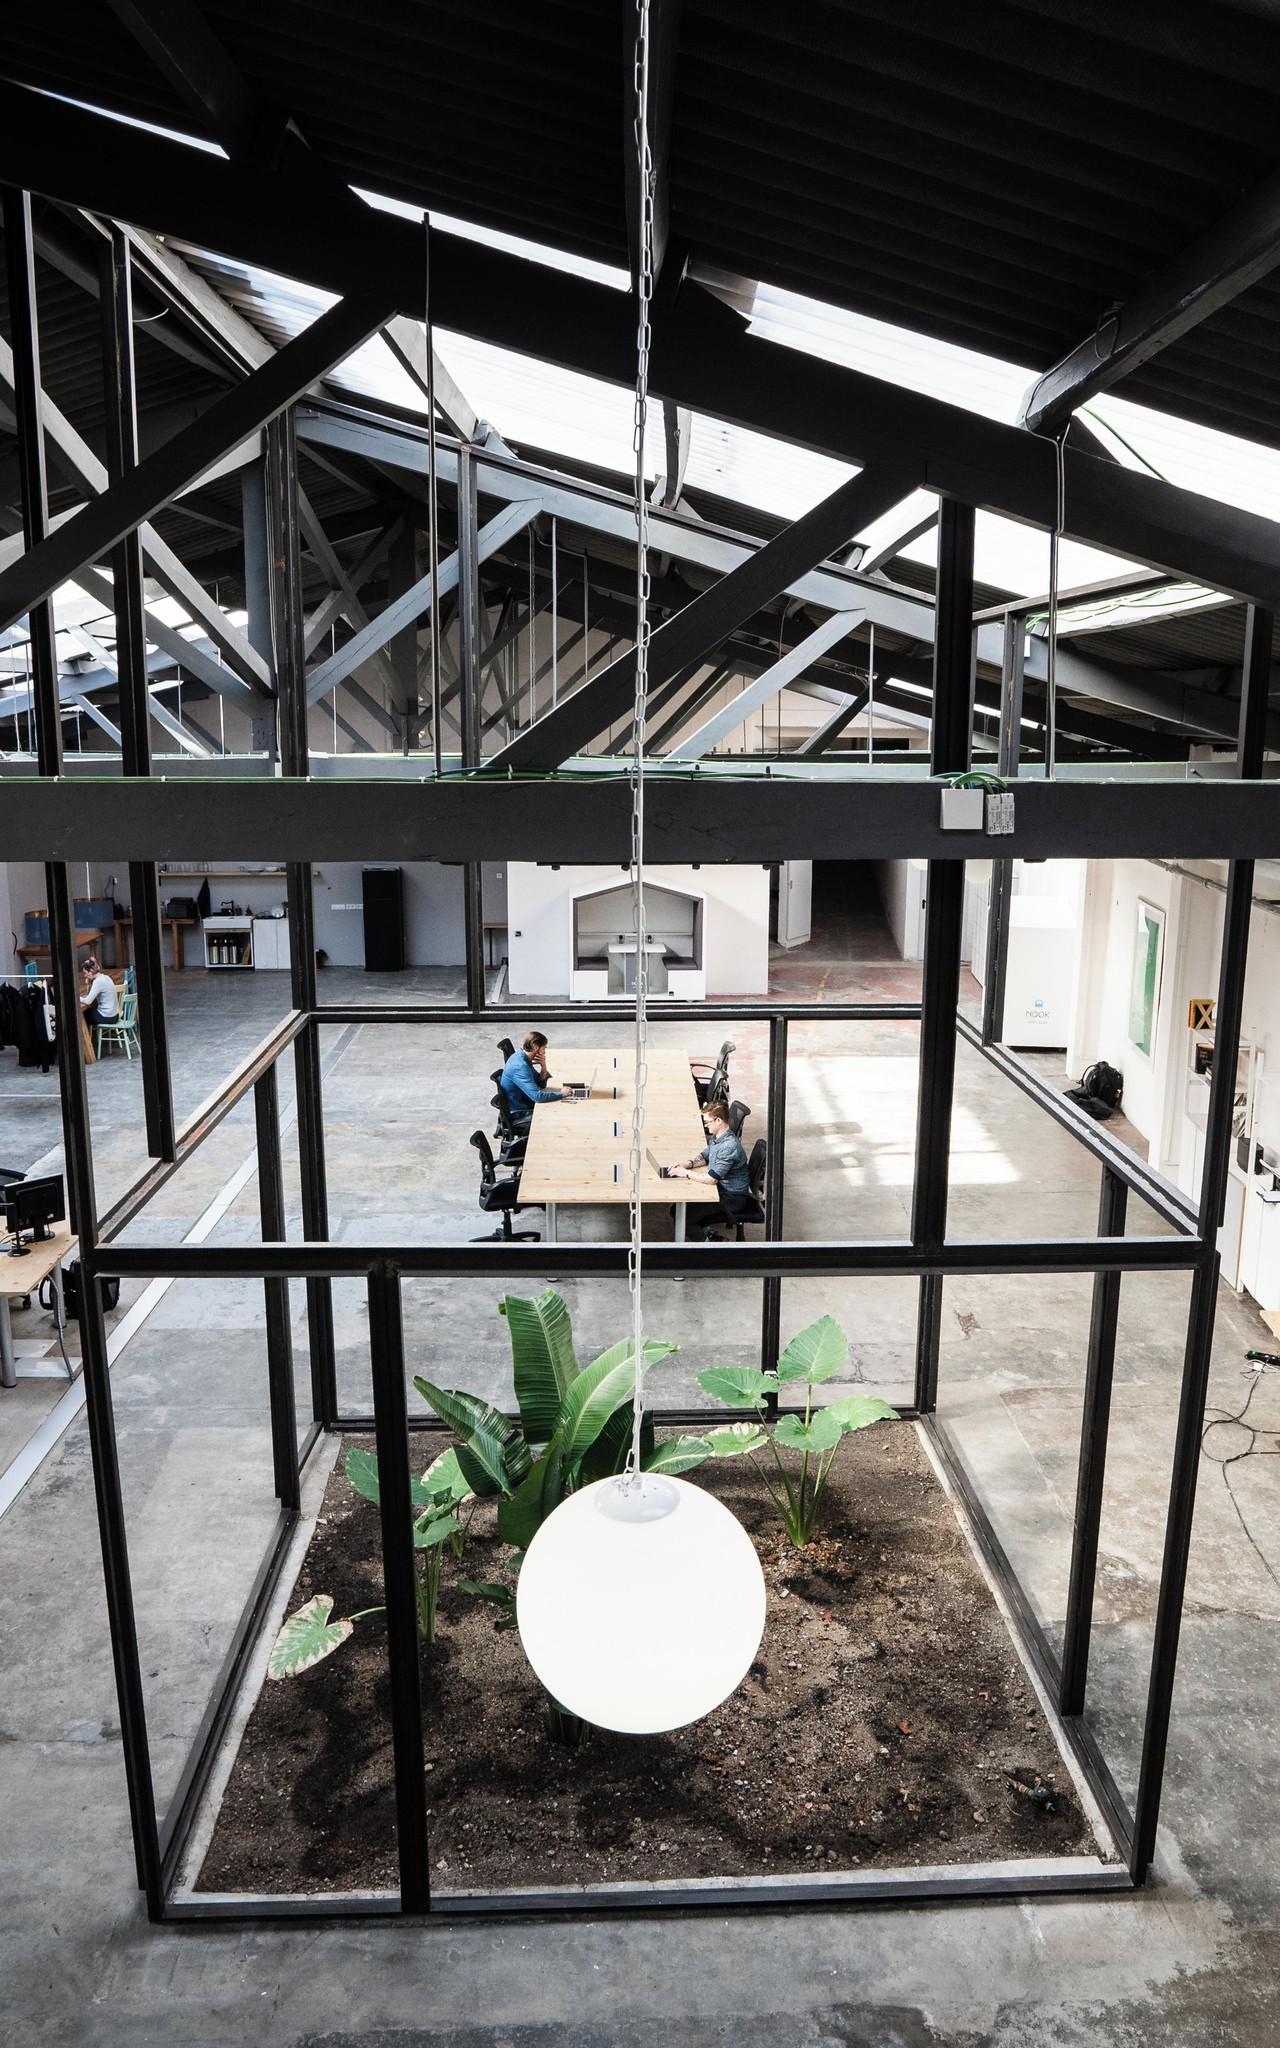 Barcelone  Lieu industriel Modern industrial warehouse venue image 0